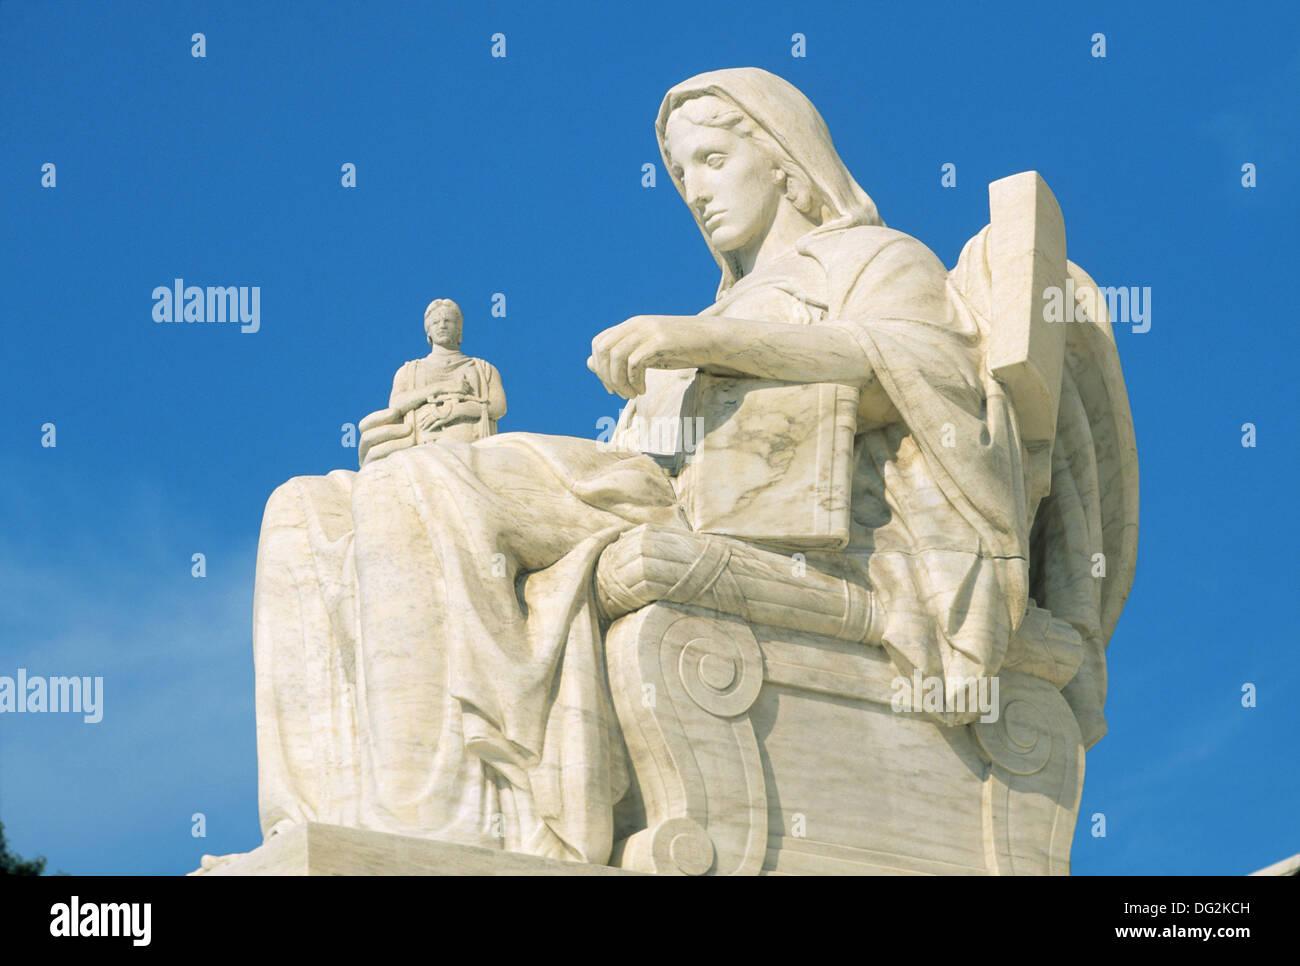 U.S. Supreme Court. Washington D.C. USA - Stock Image